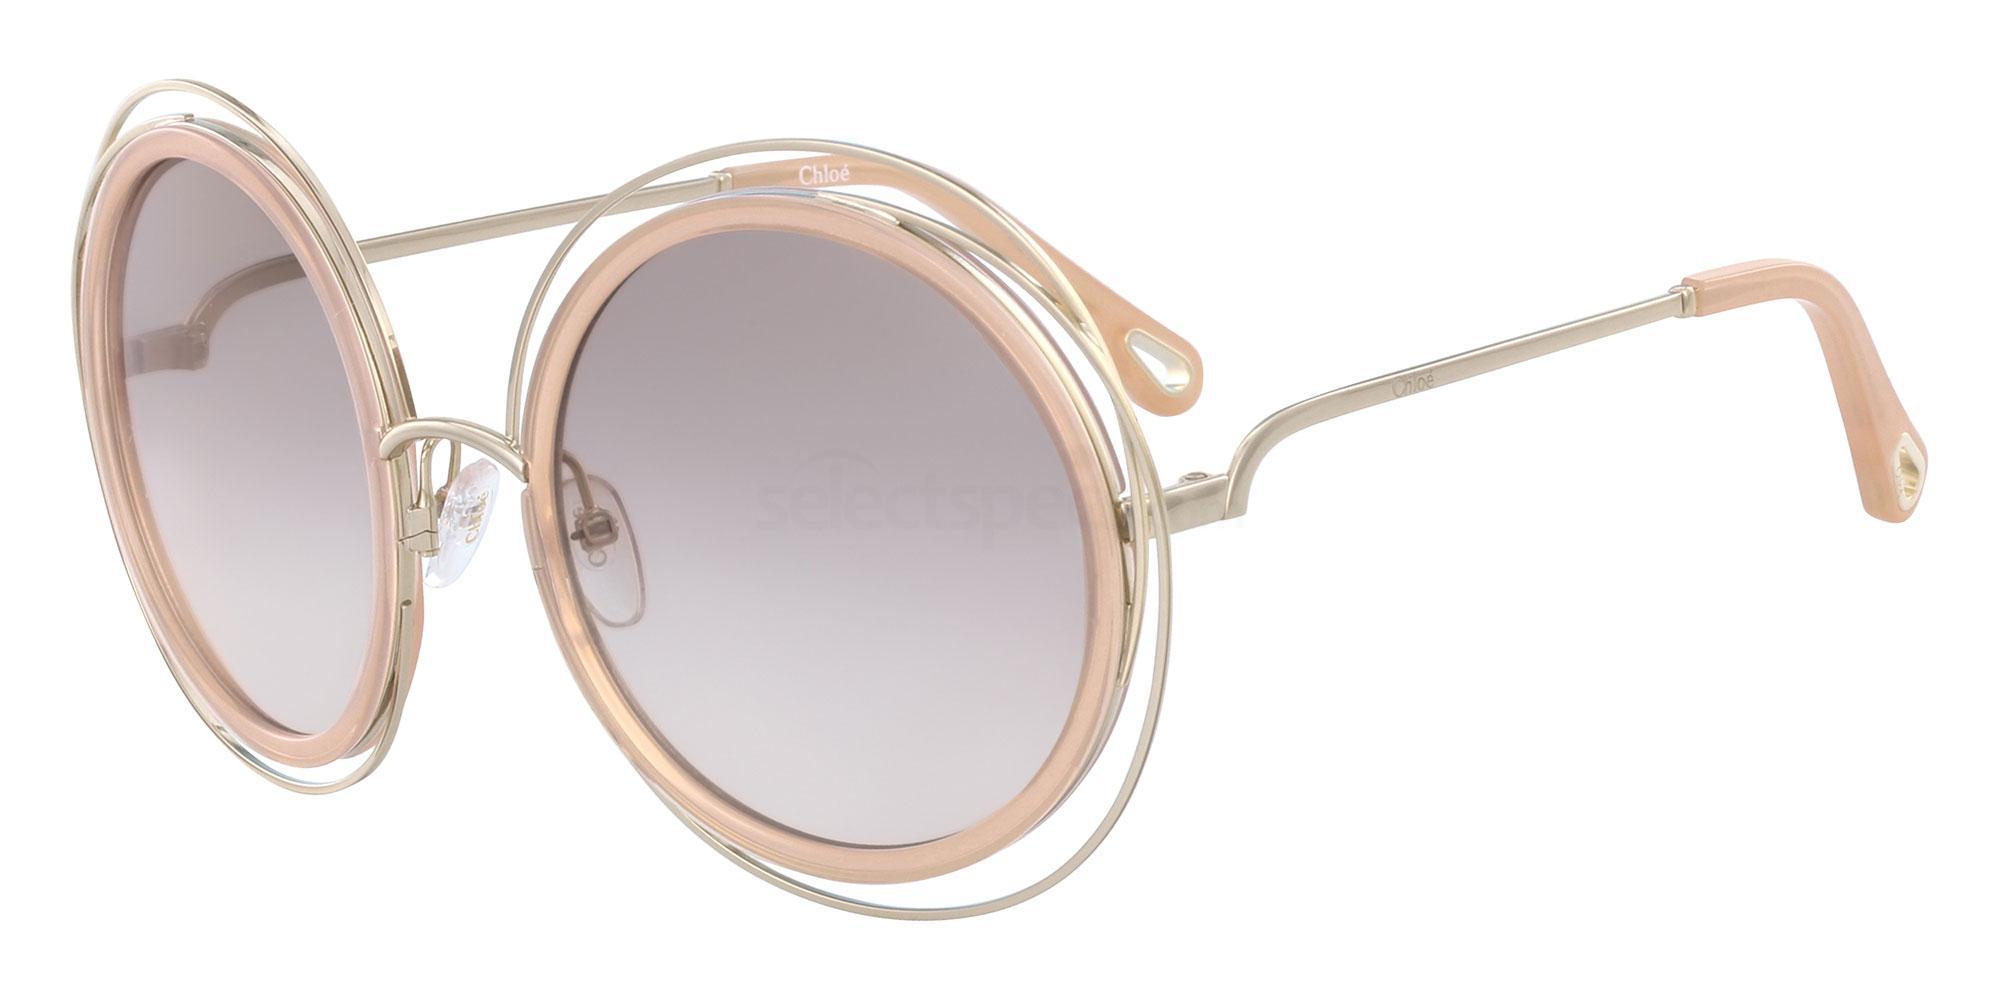 724 CE120SD Sunglasses, Chloe